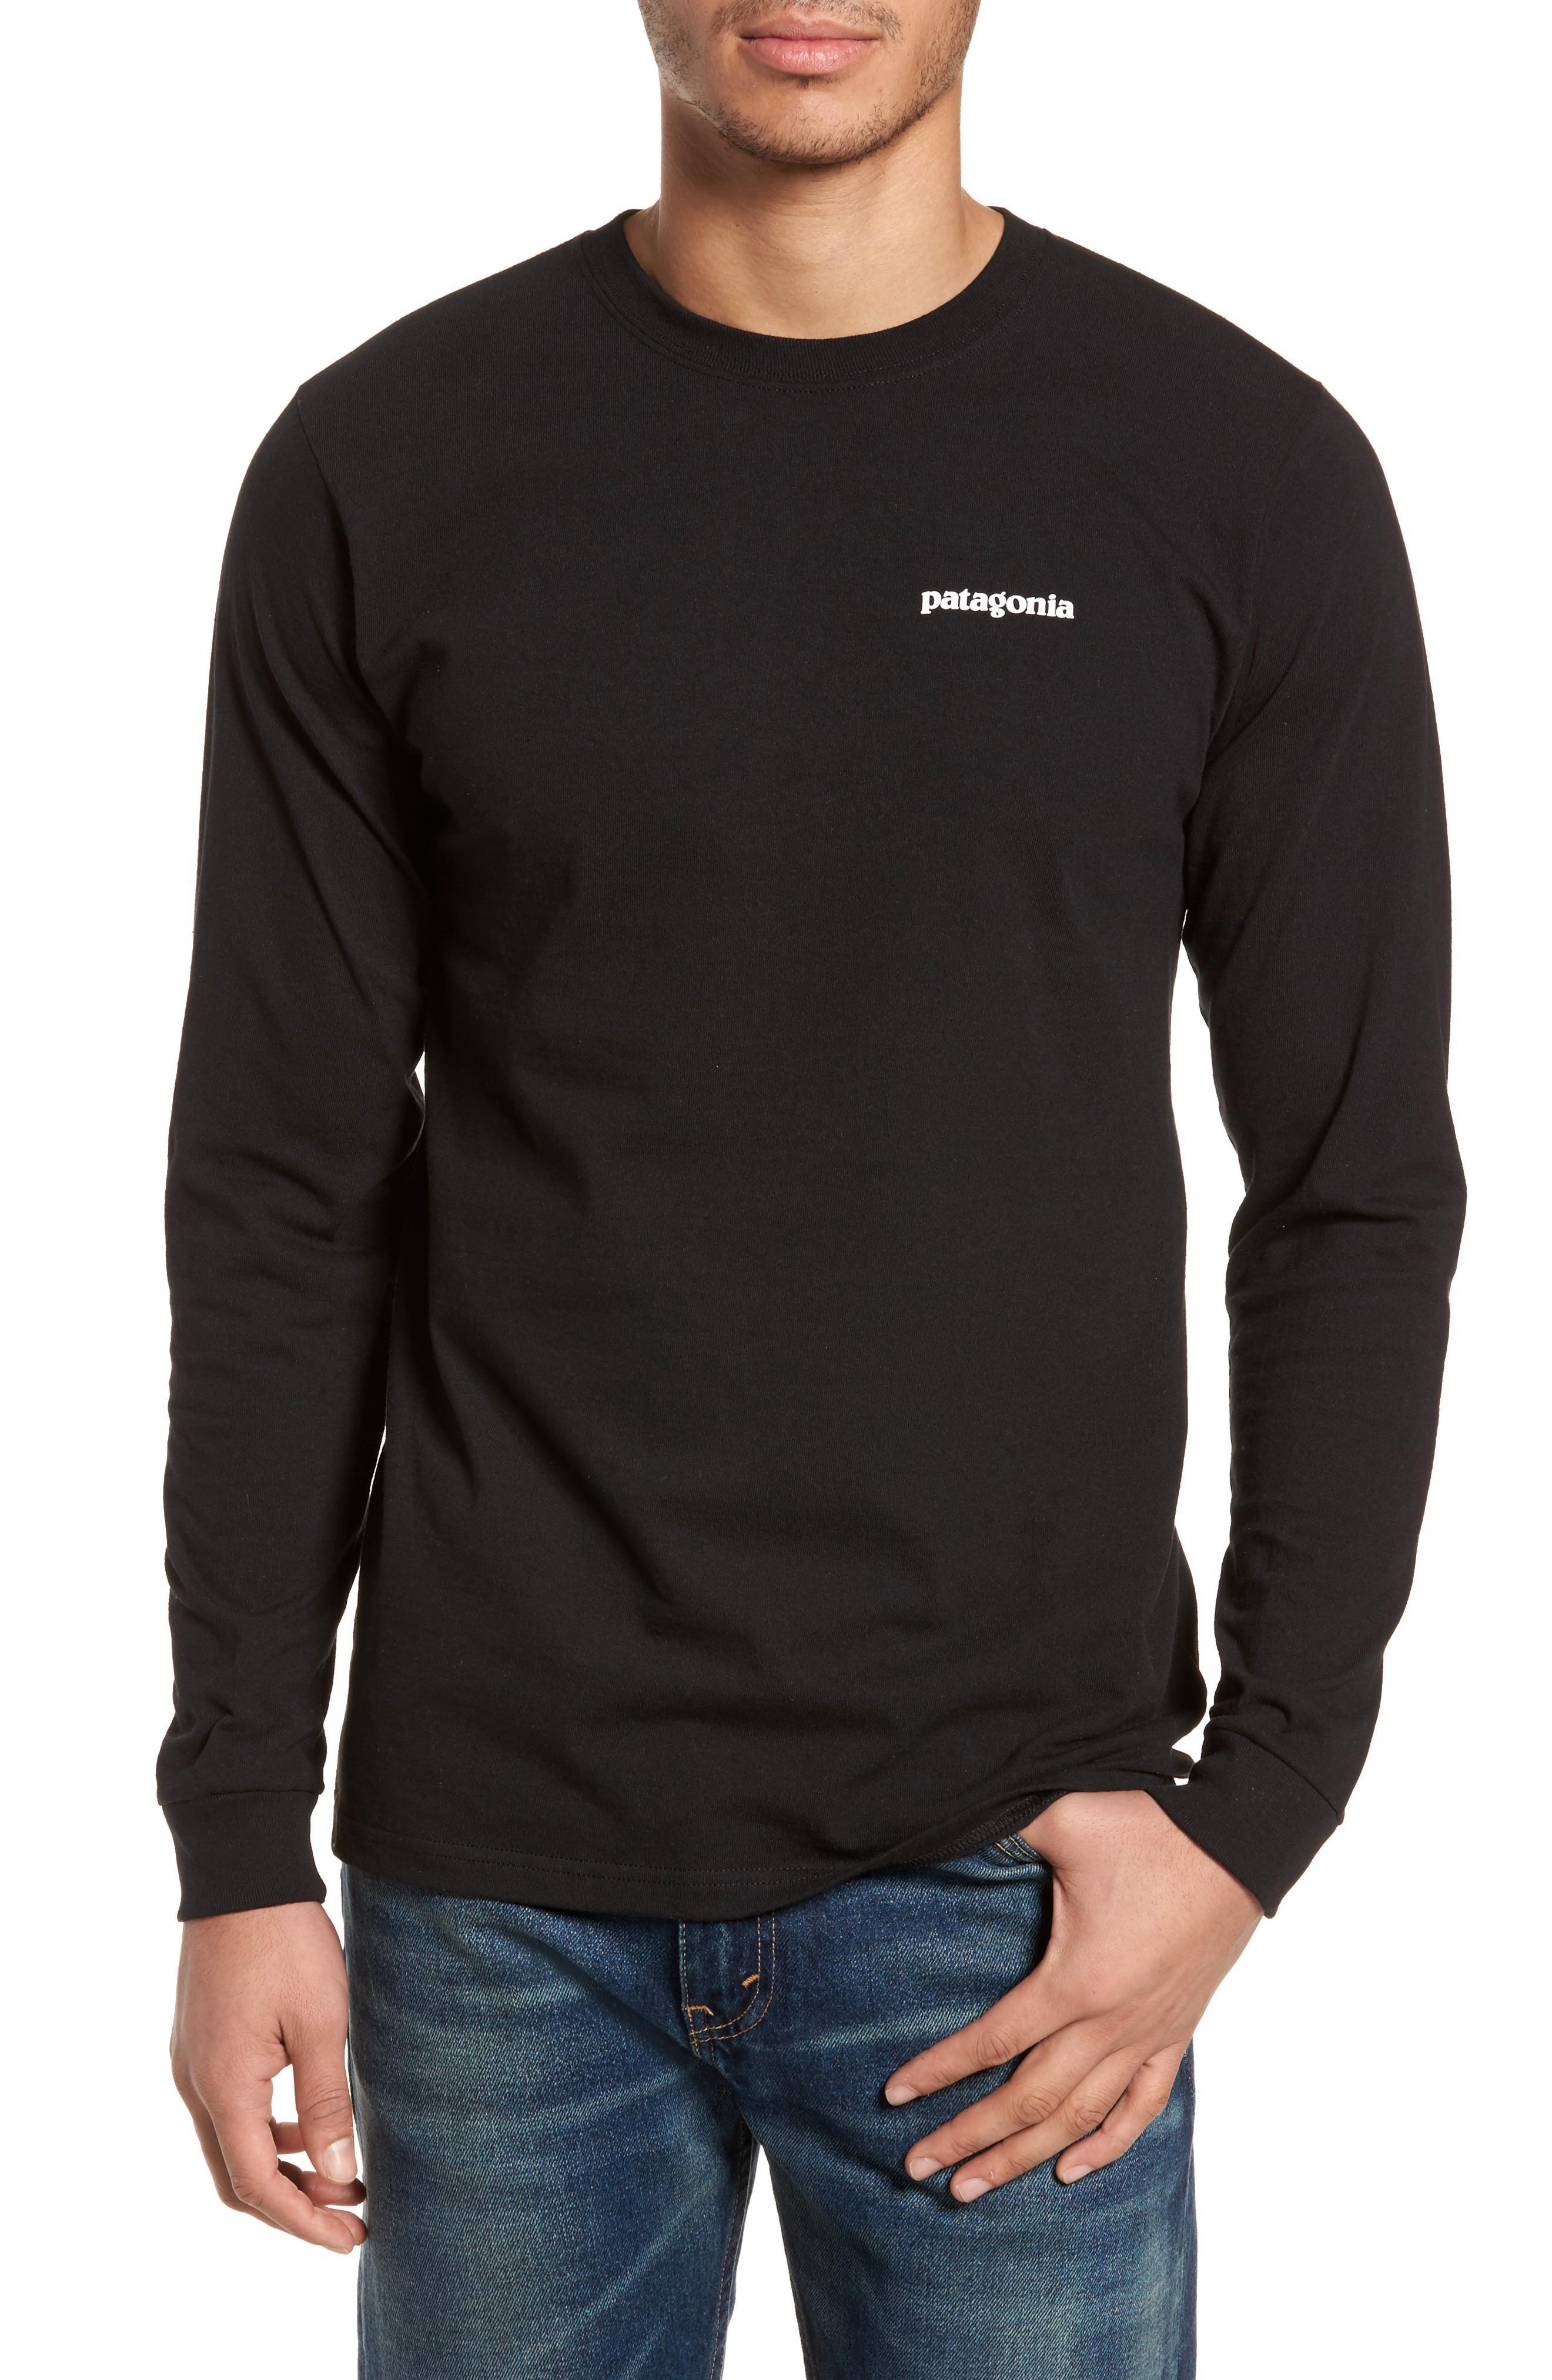 Patagonia Responsibili-Tee Long Sleeve T-Shirt In Black